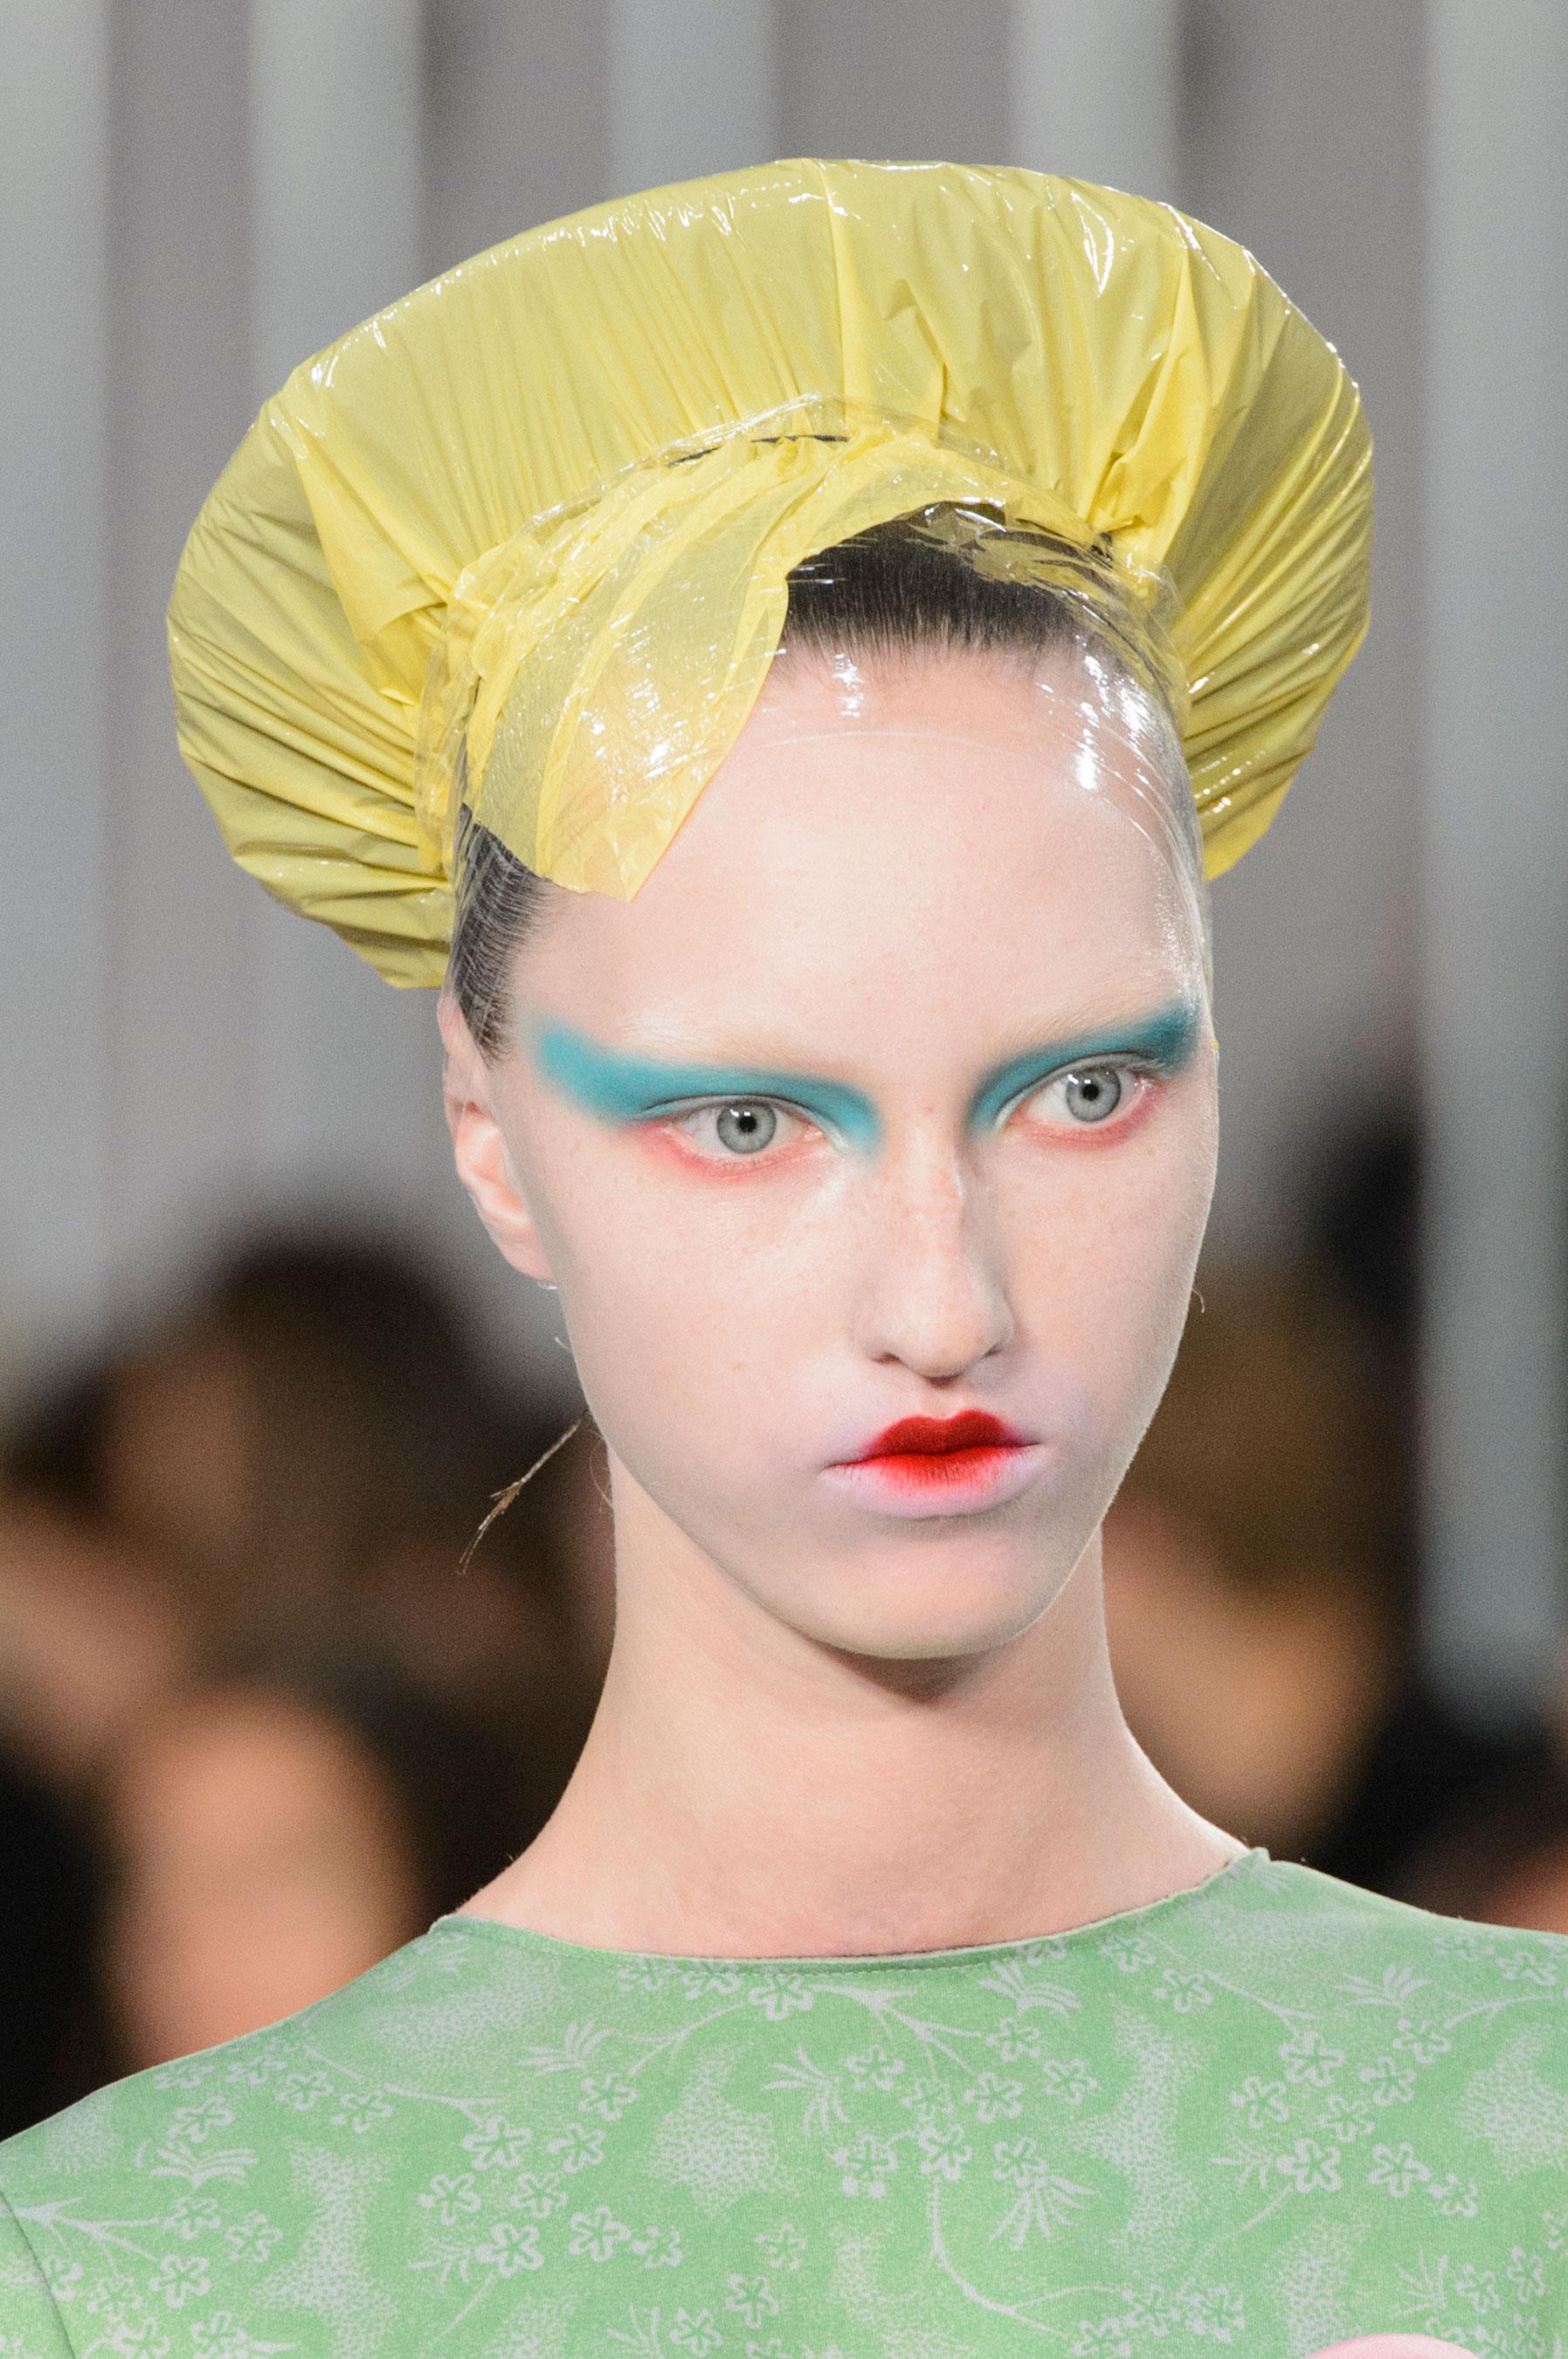 Maison-Margiela-spring-2016-runway-beauty-fashion-show-the-impression-023